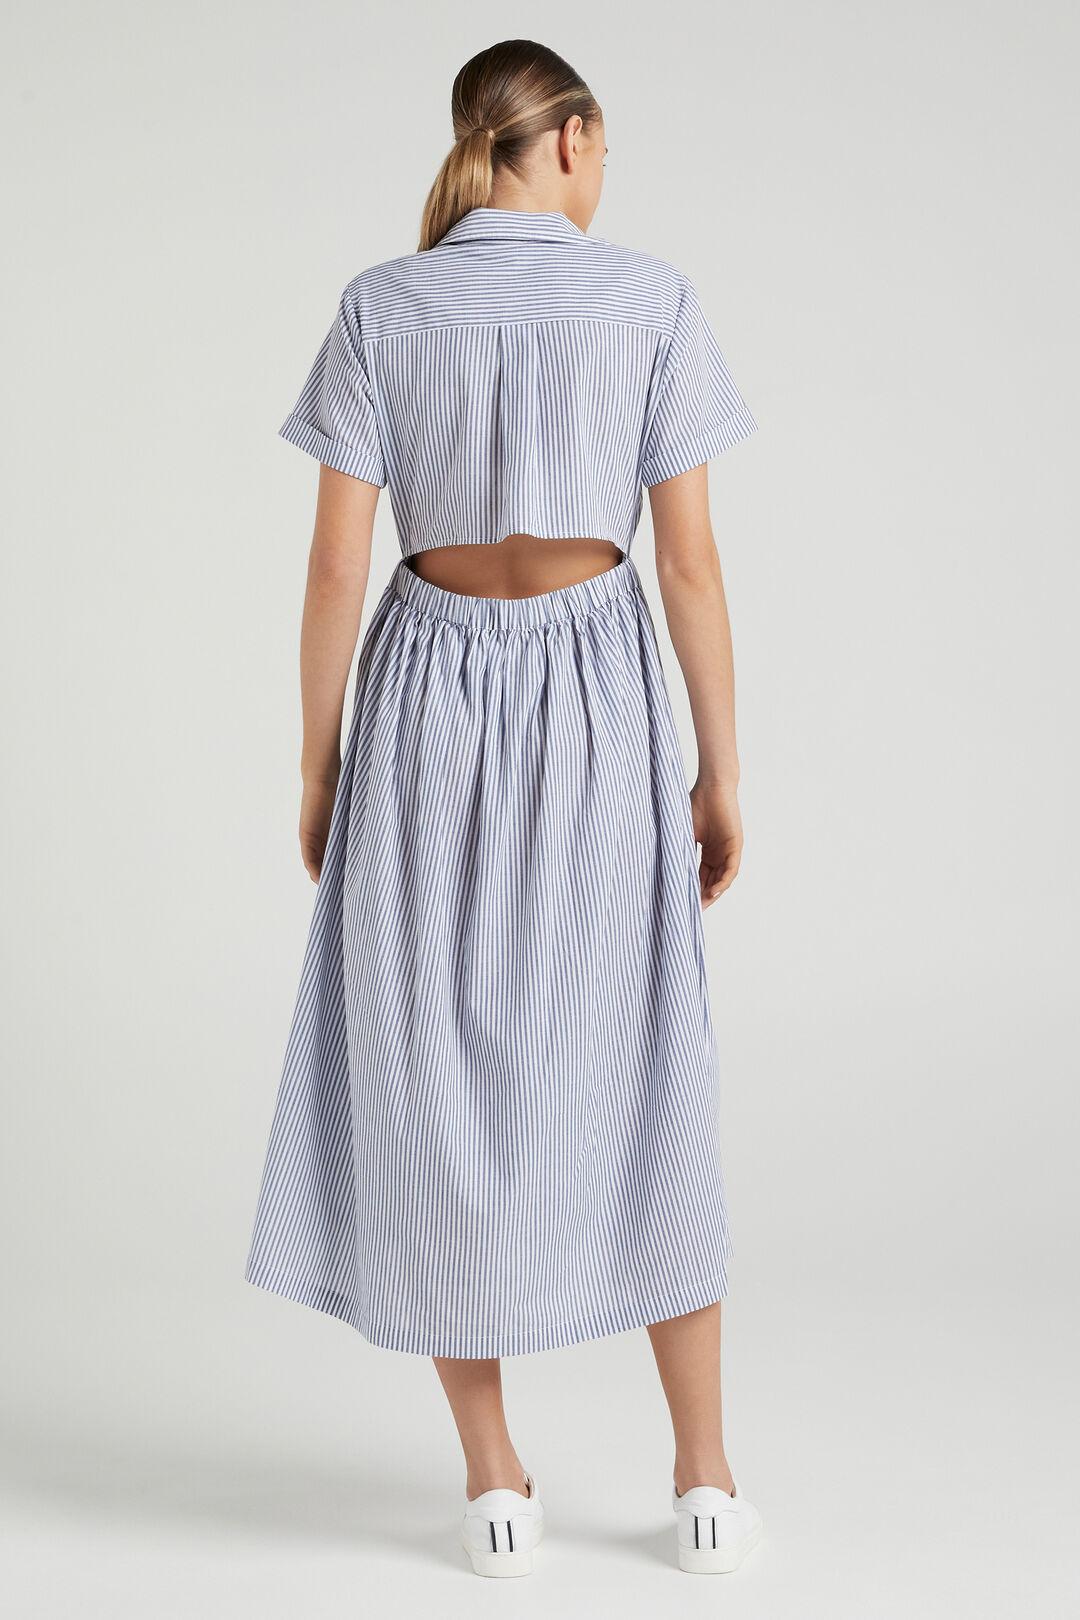 STRIPE CUT OUT DRESS  BLUE/WHITE  hi-res